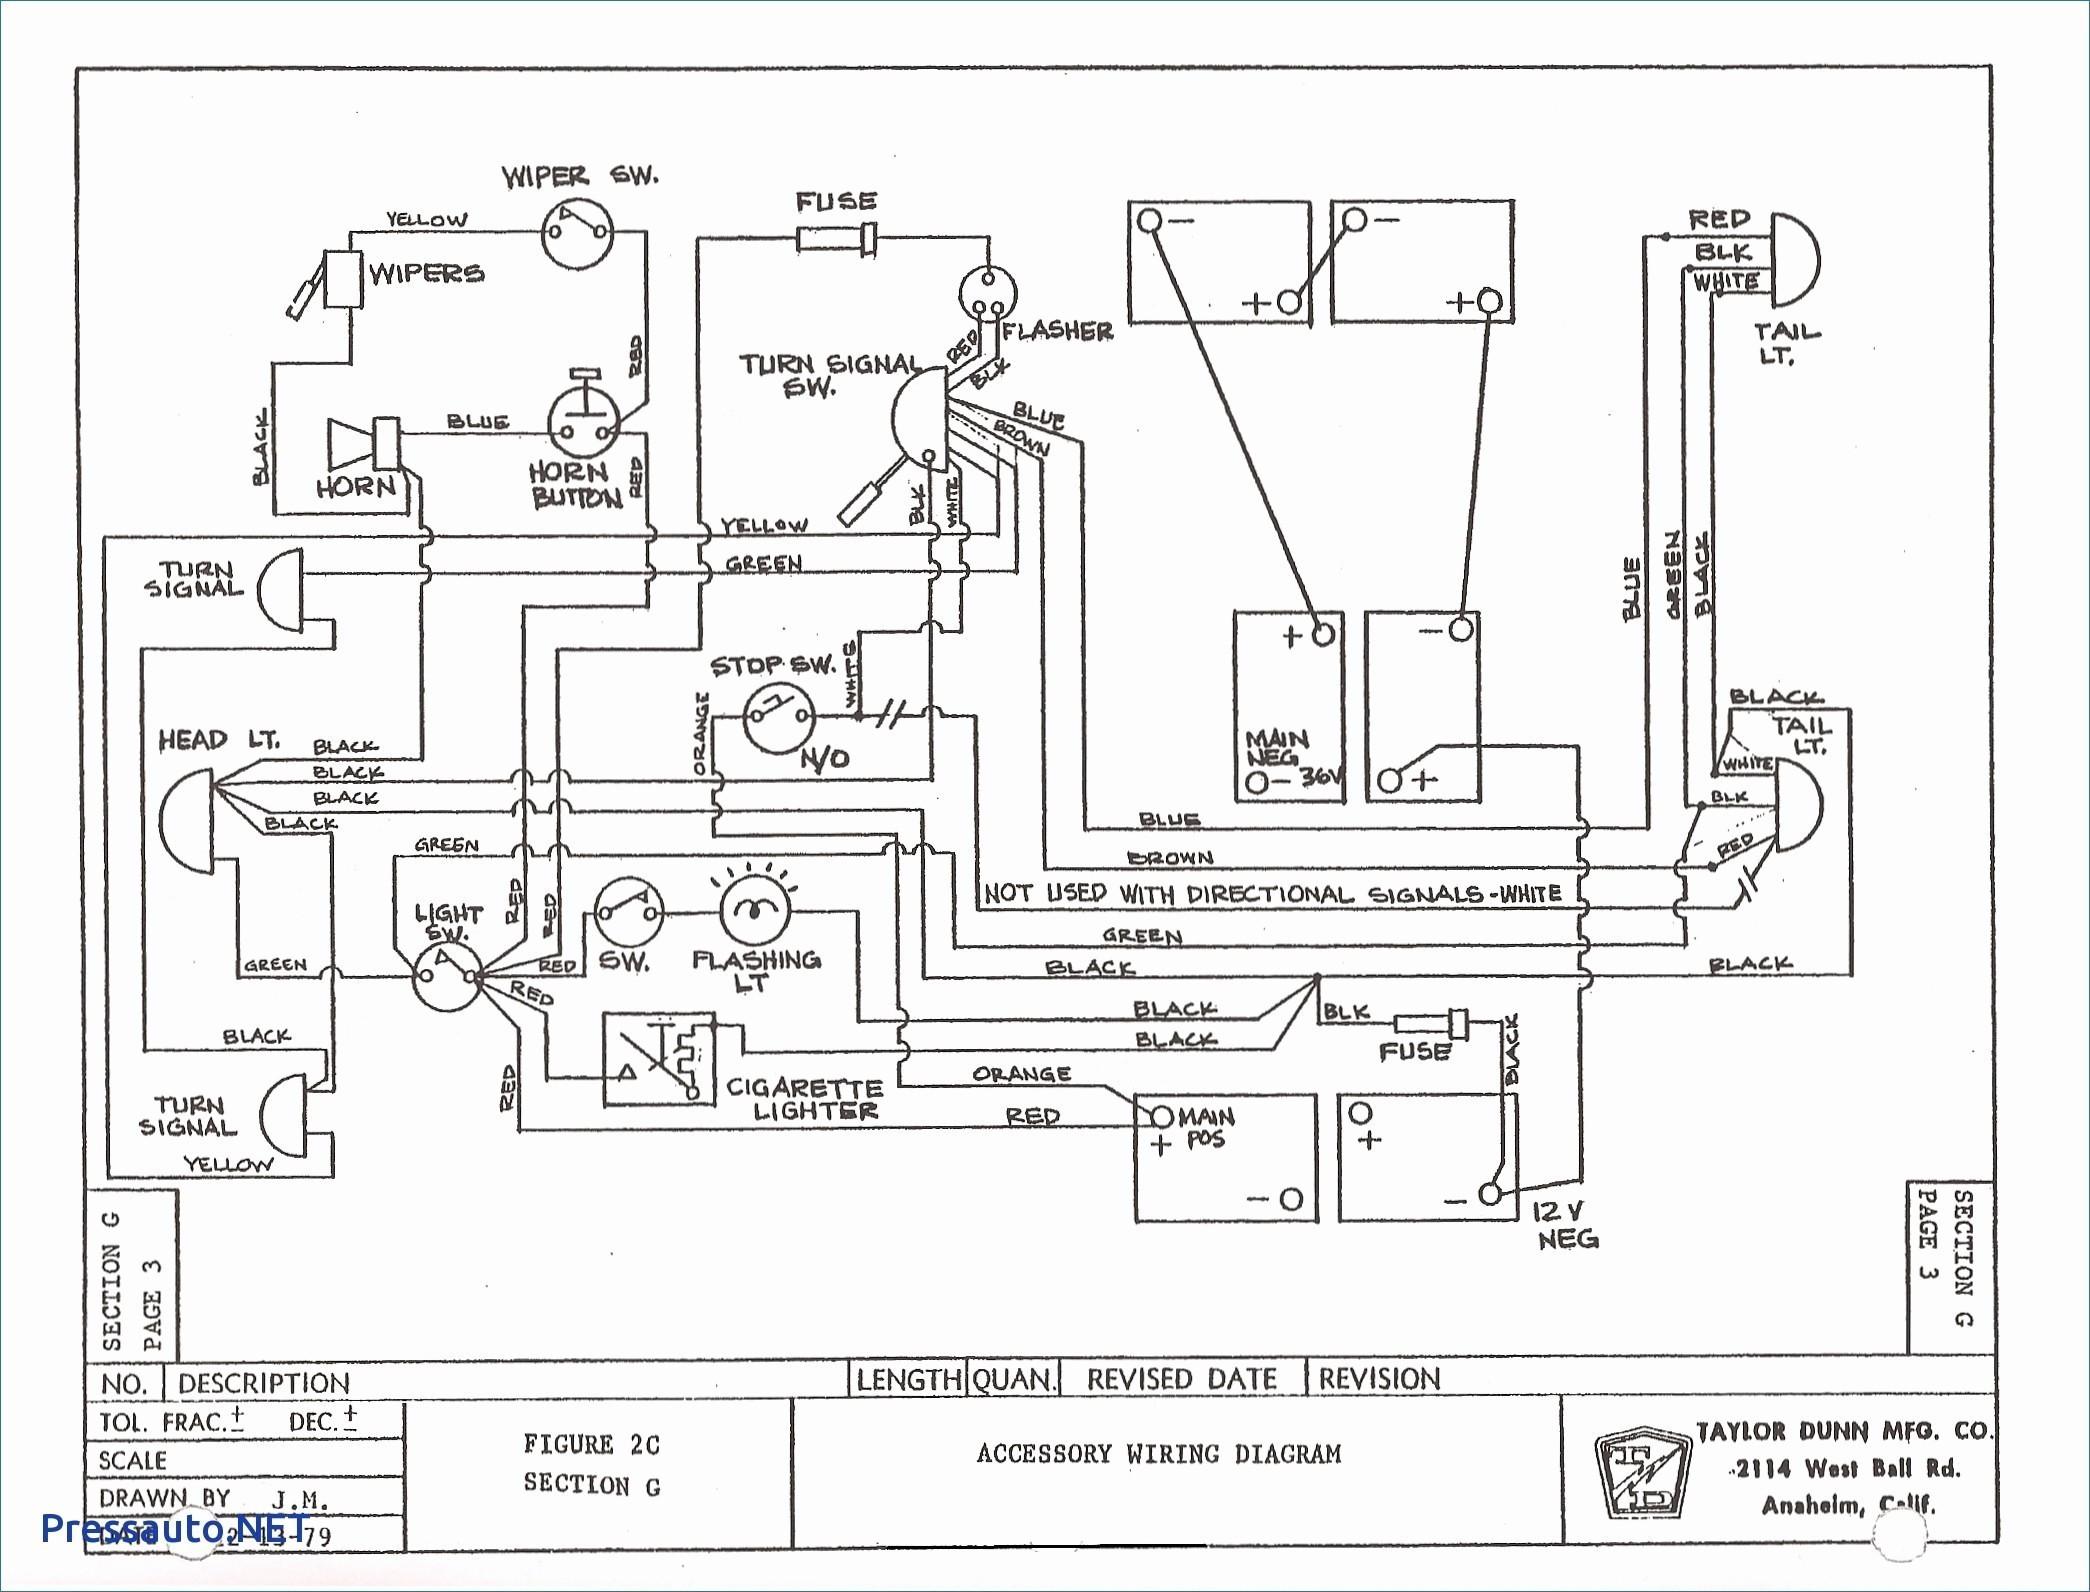 1986 Par Car Wiring Diagram | Wiring Diagram Vintage Golf Cart Wiring Diagram For Electric on